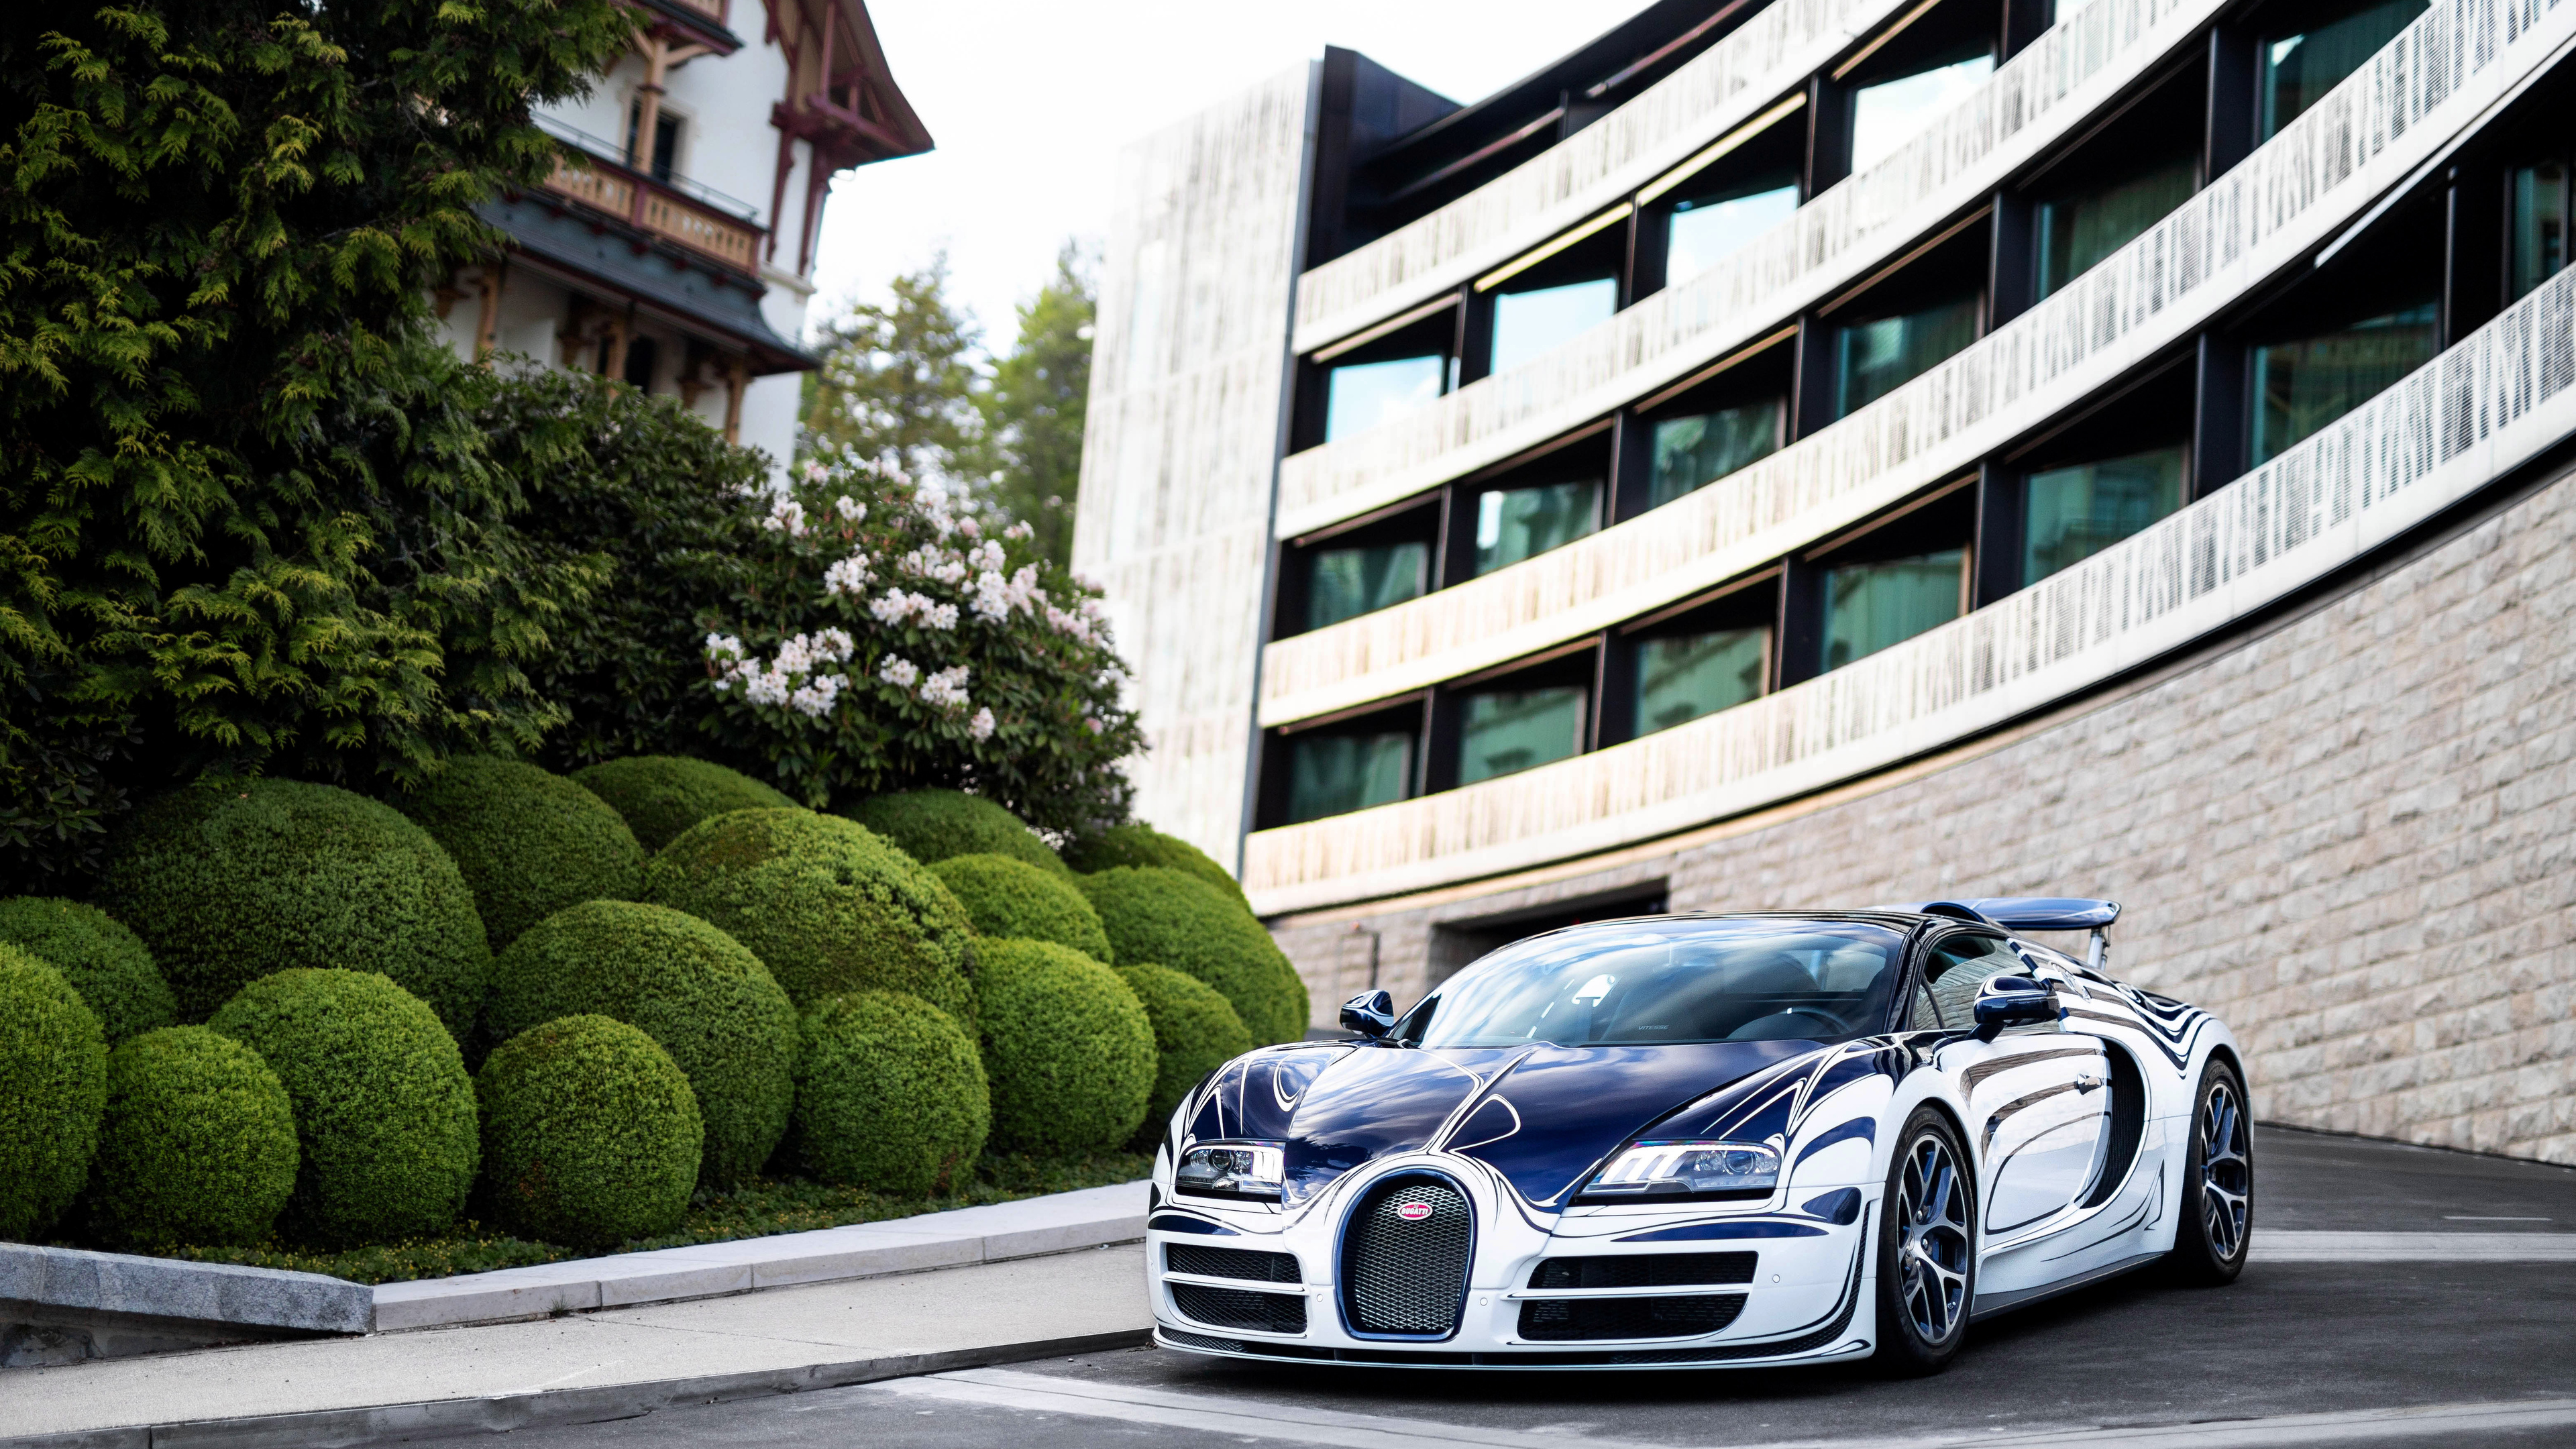 bugatti-veyron-grand-sport-roadster-5k-sd.jpg